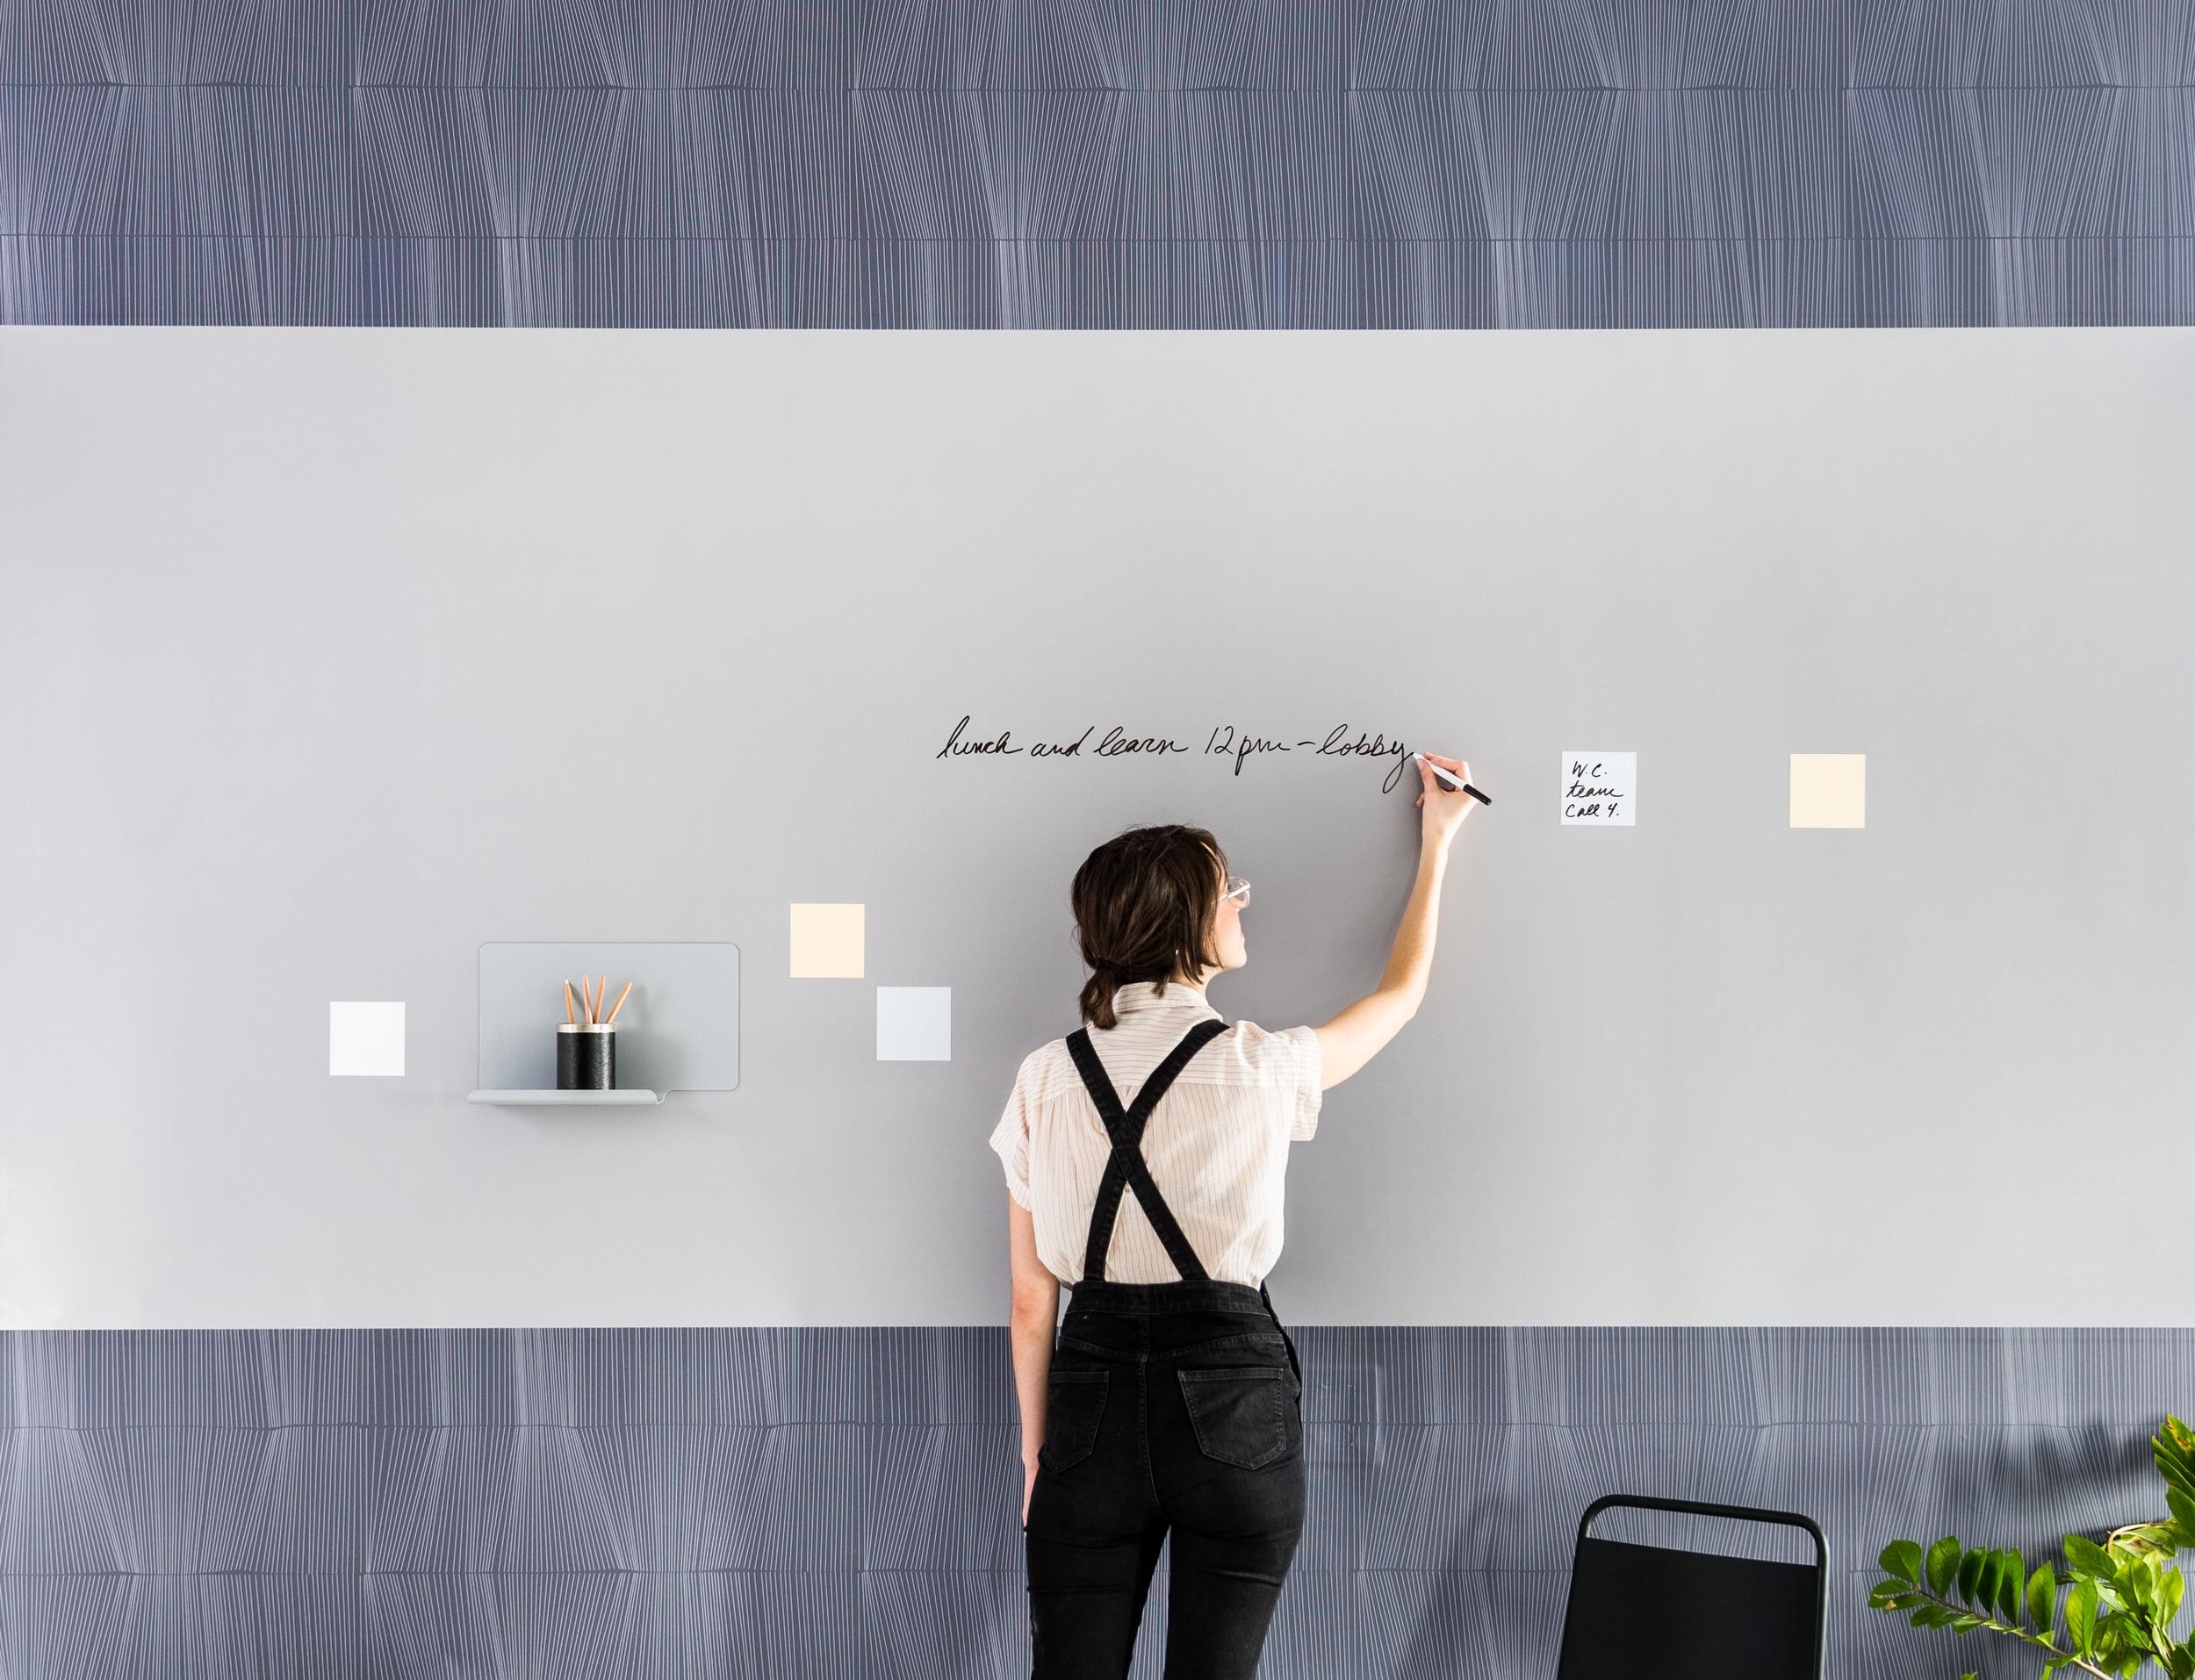 forces - Designer: Jill MalekVIEW COLLECTIONDry erase + textile integration.